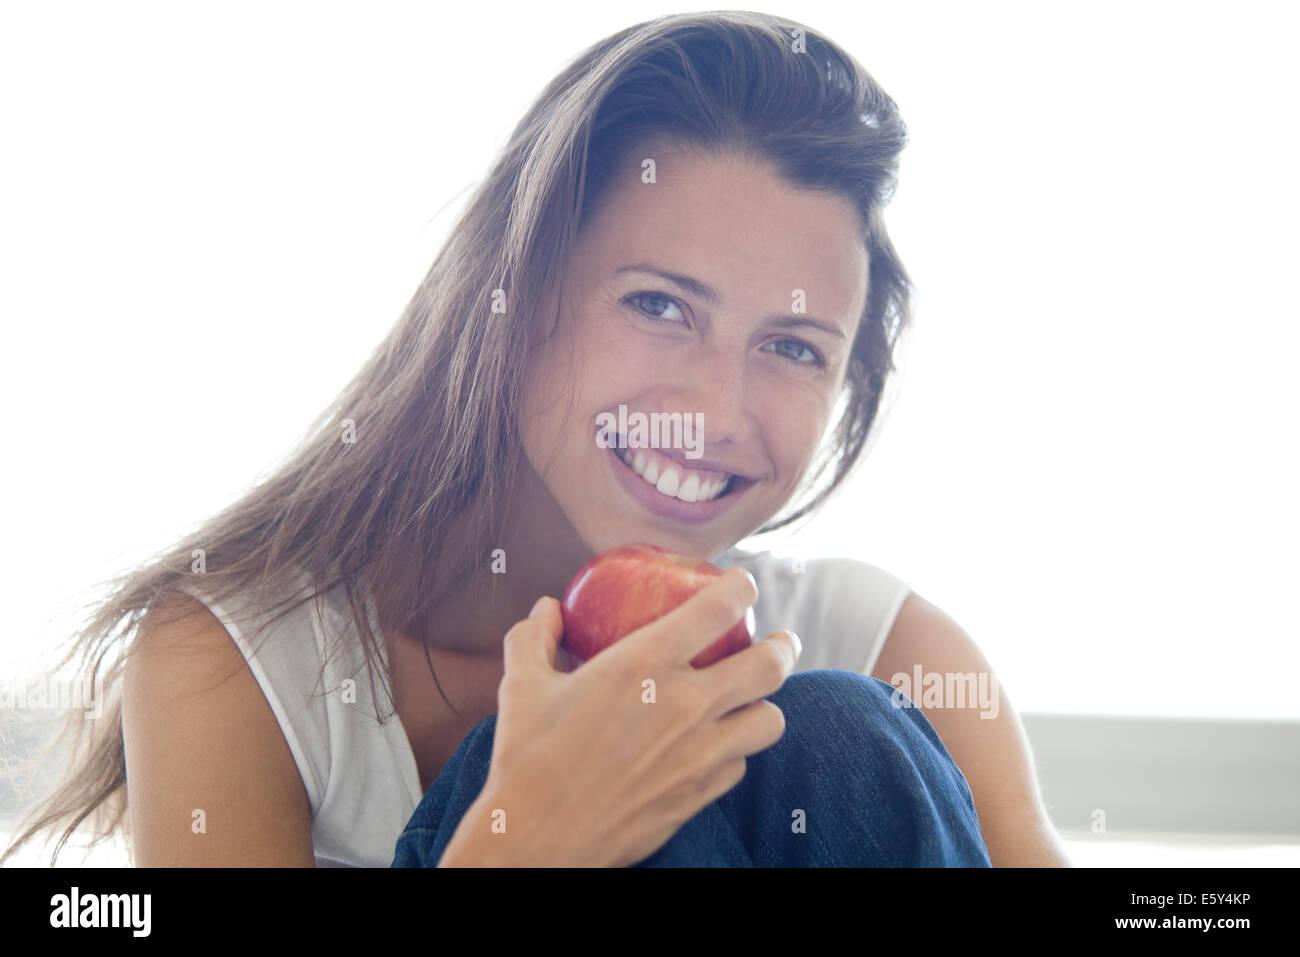 Woman holding apple, smiling, portrait Photo Stock